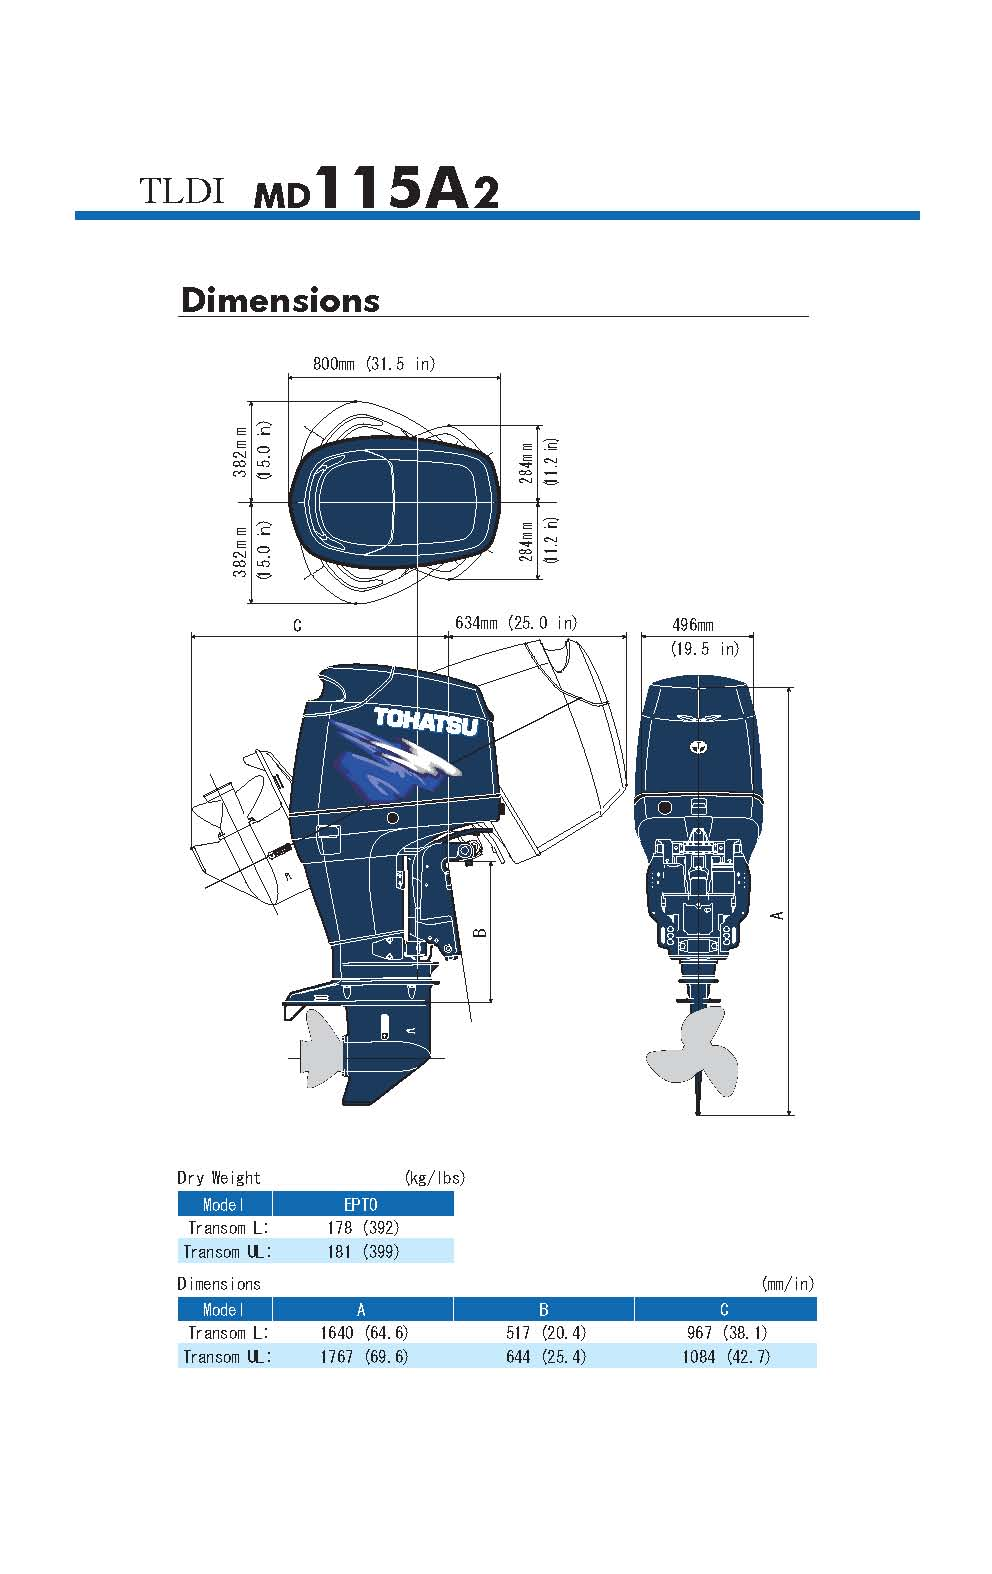 маркировка ноги лодочного мотора